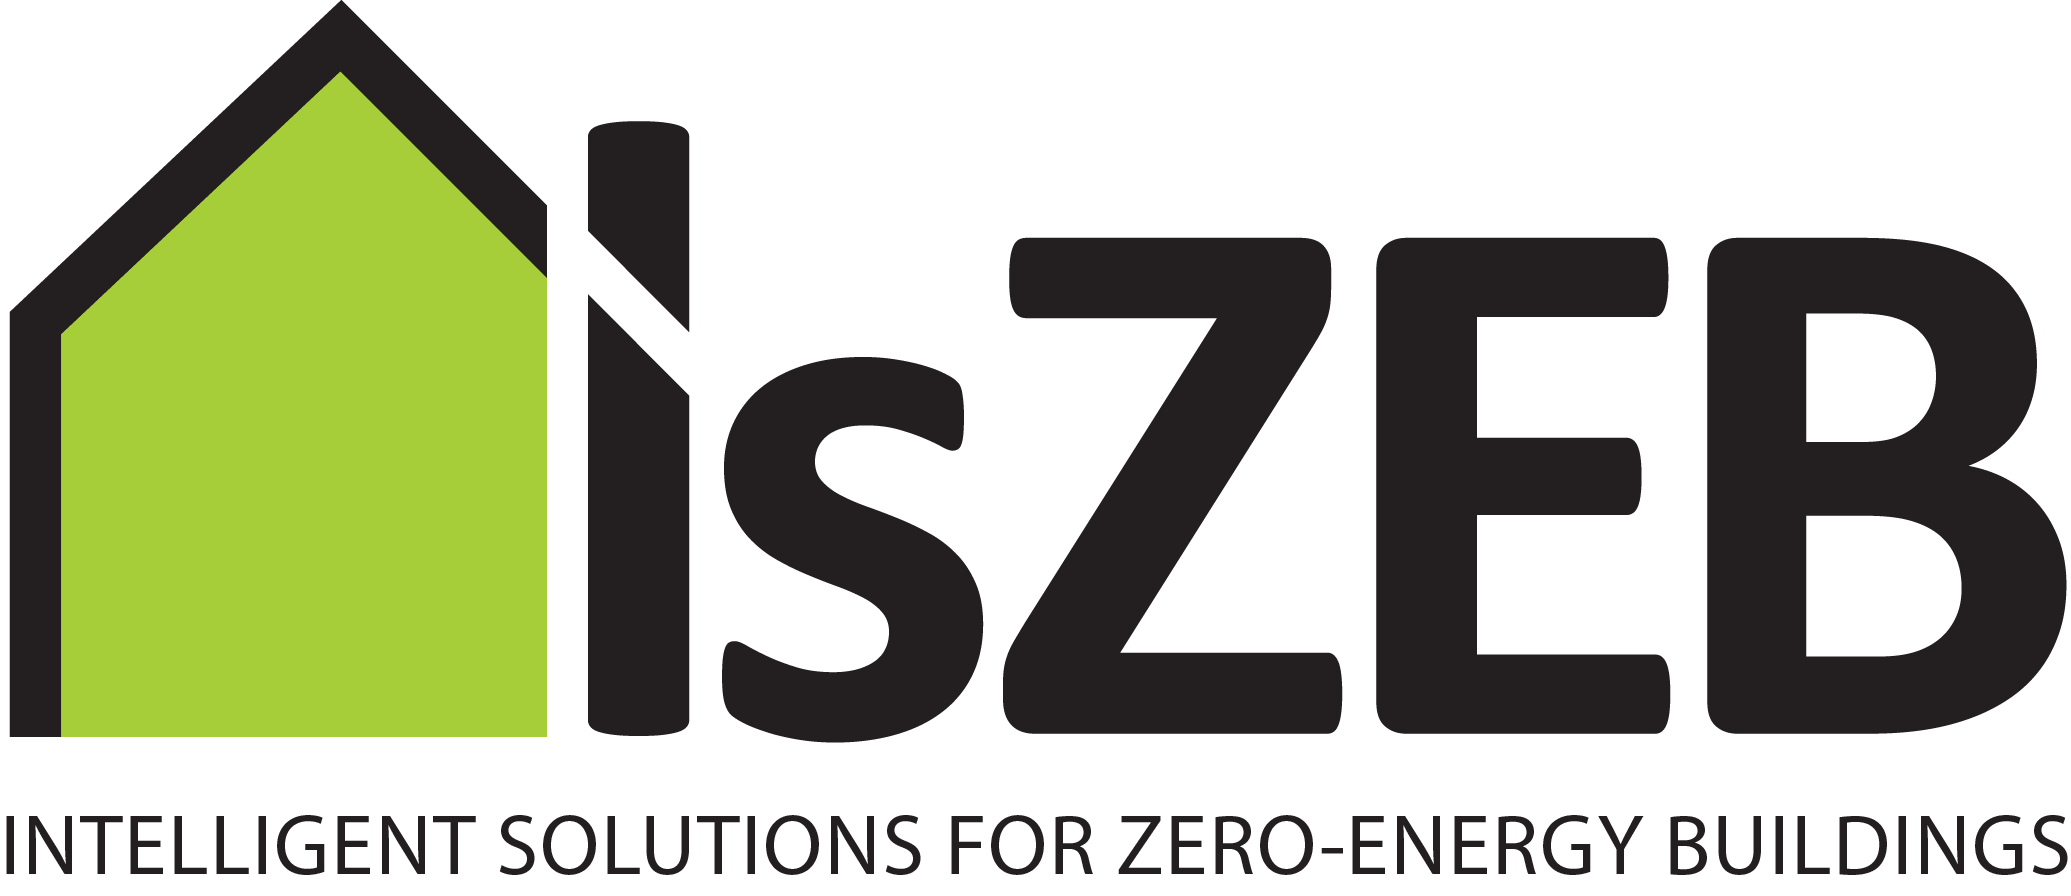 isneb logo